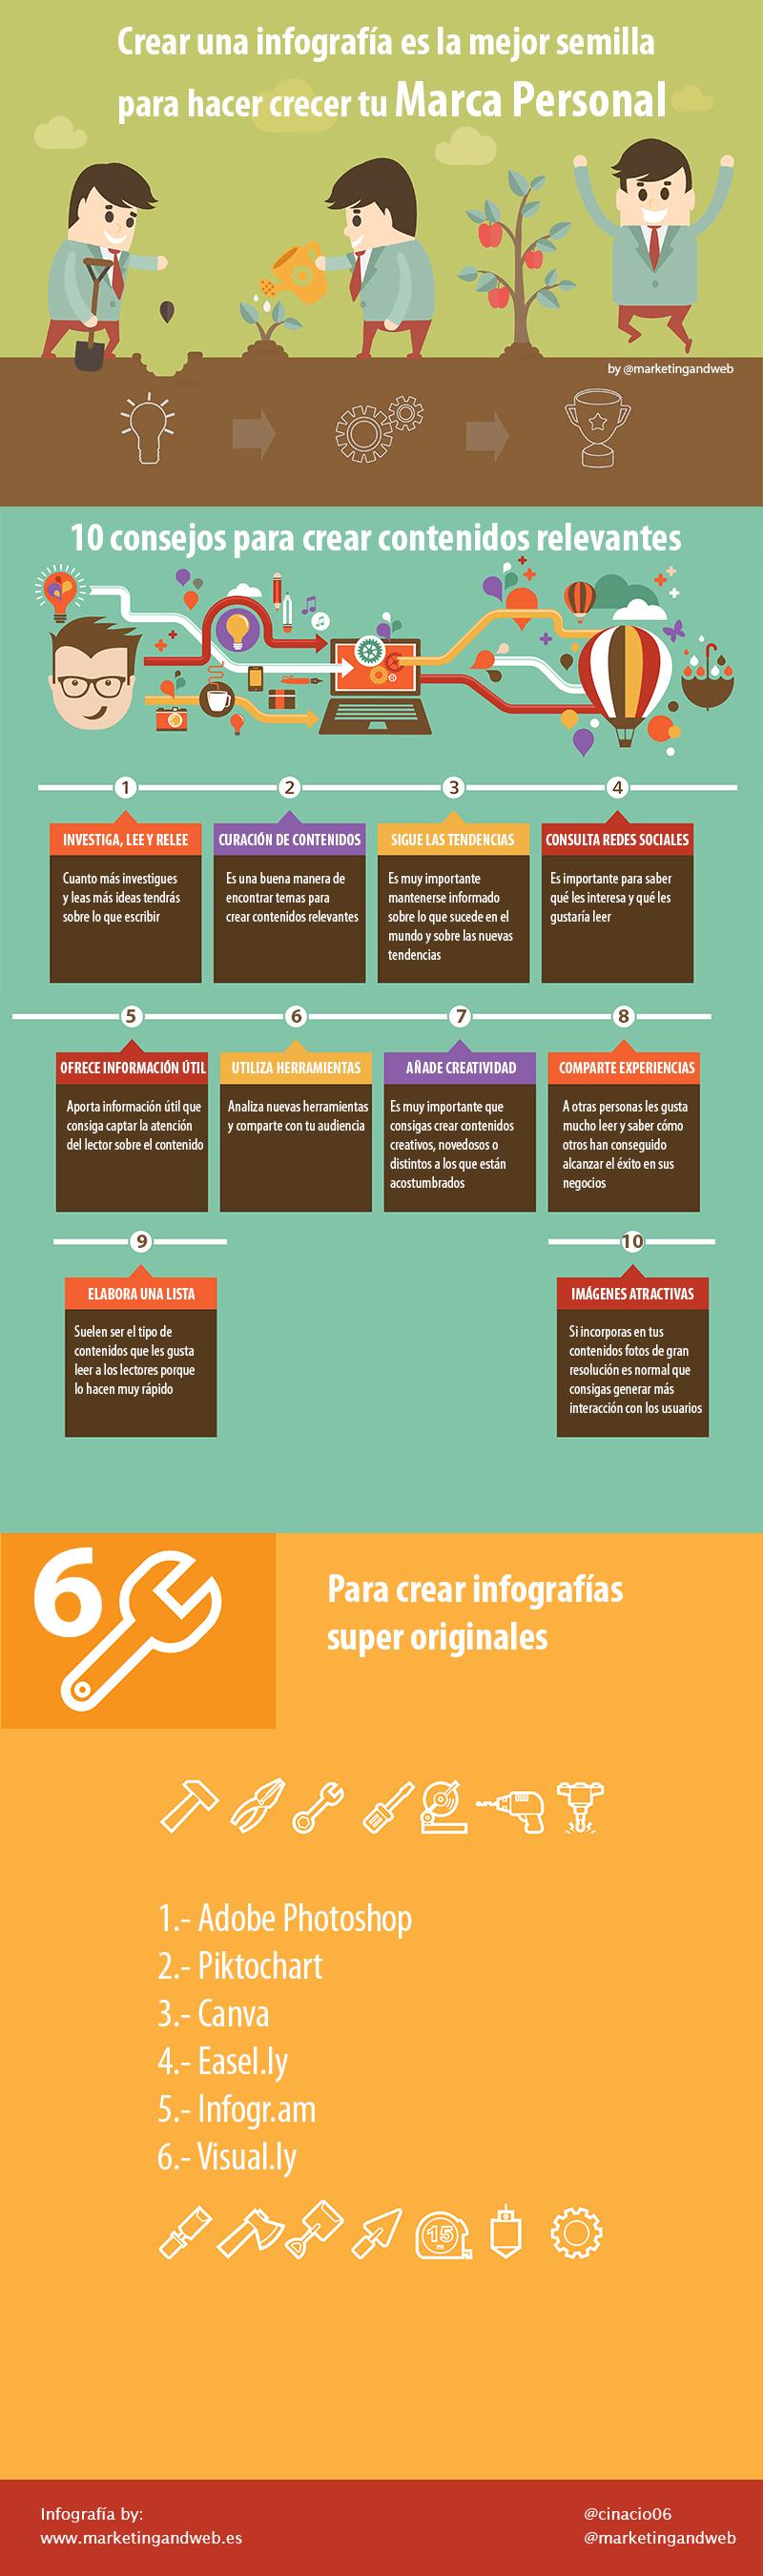 Cómo crear infografías online con Piktochart en solo 5 pasos - photo#14